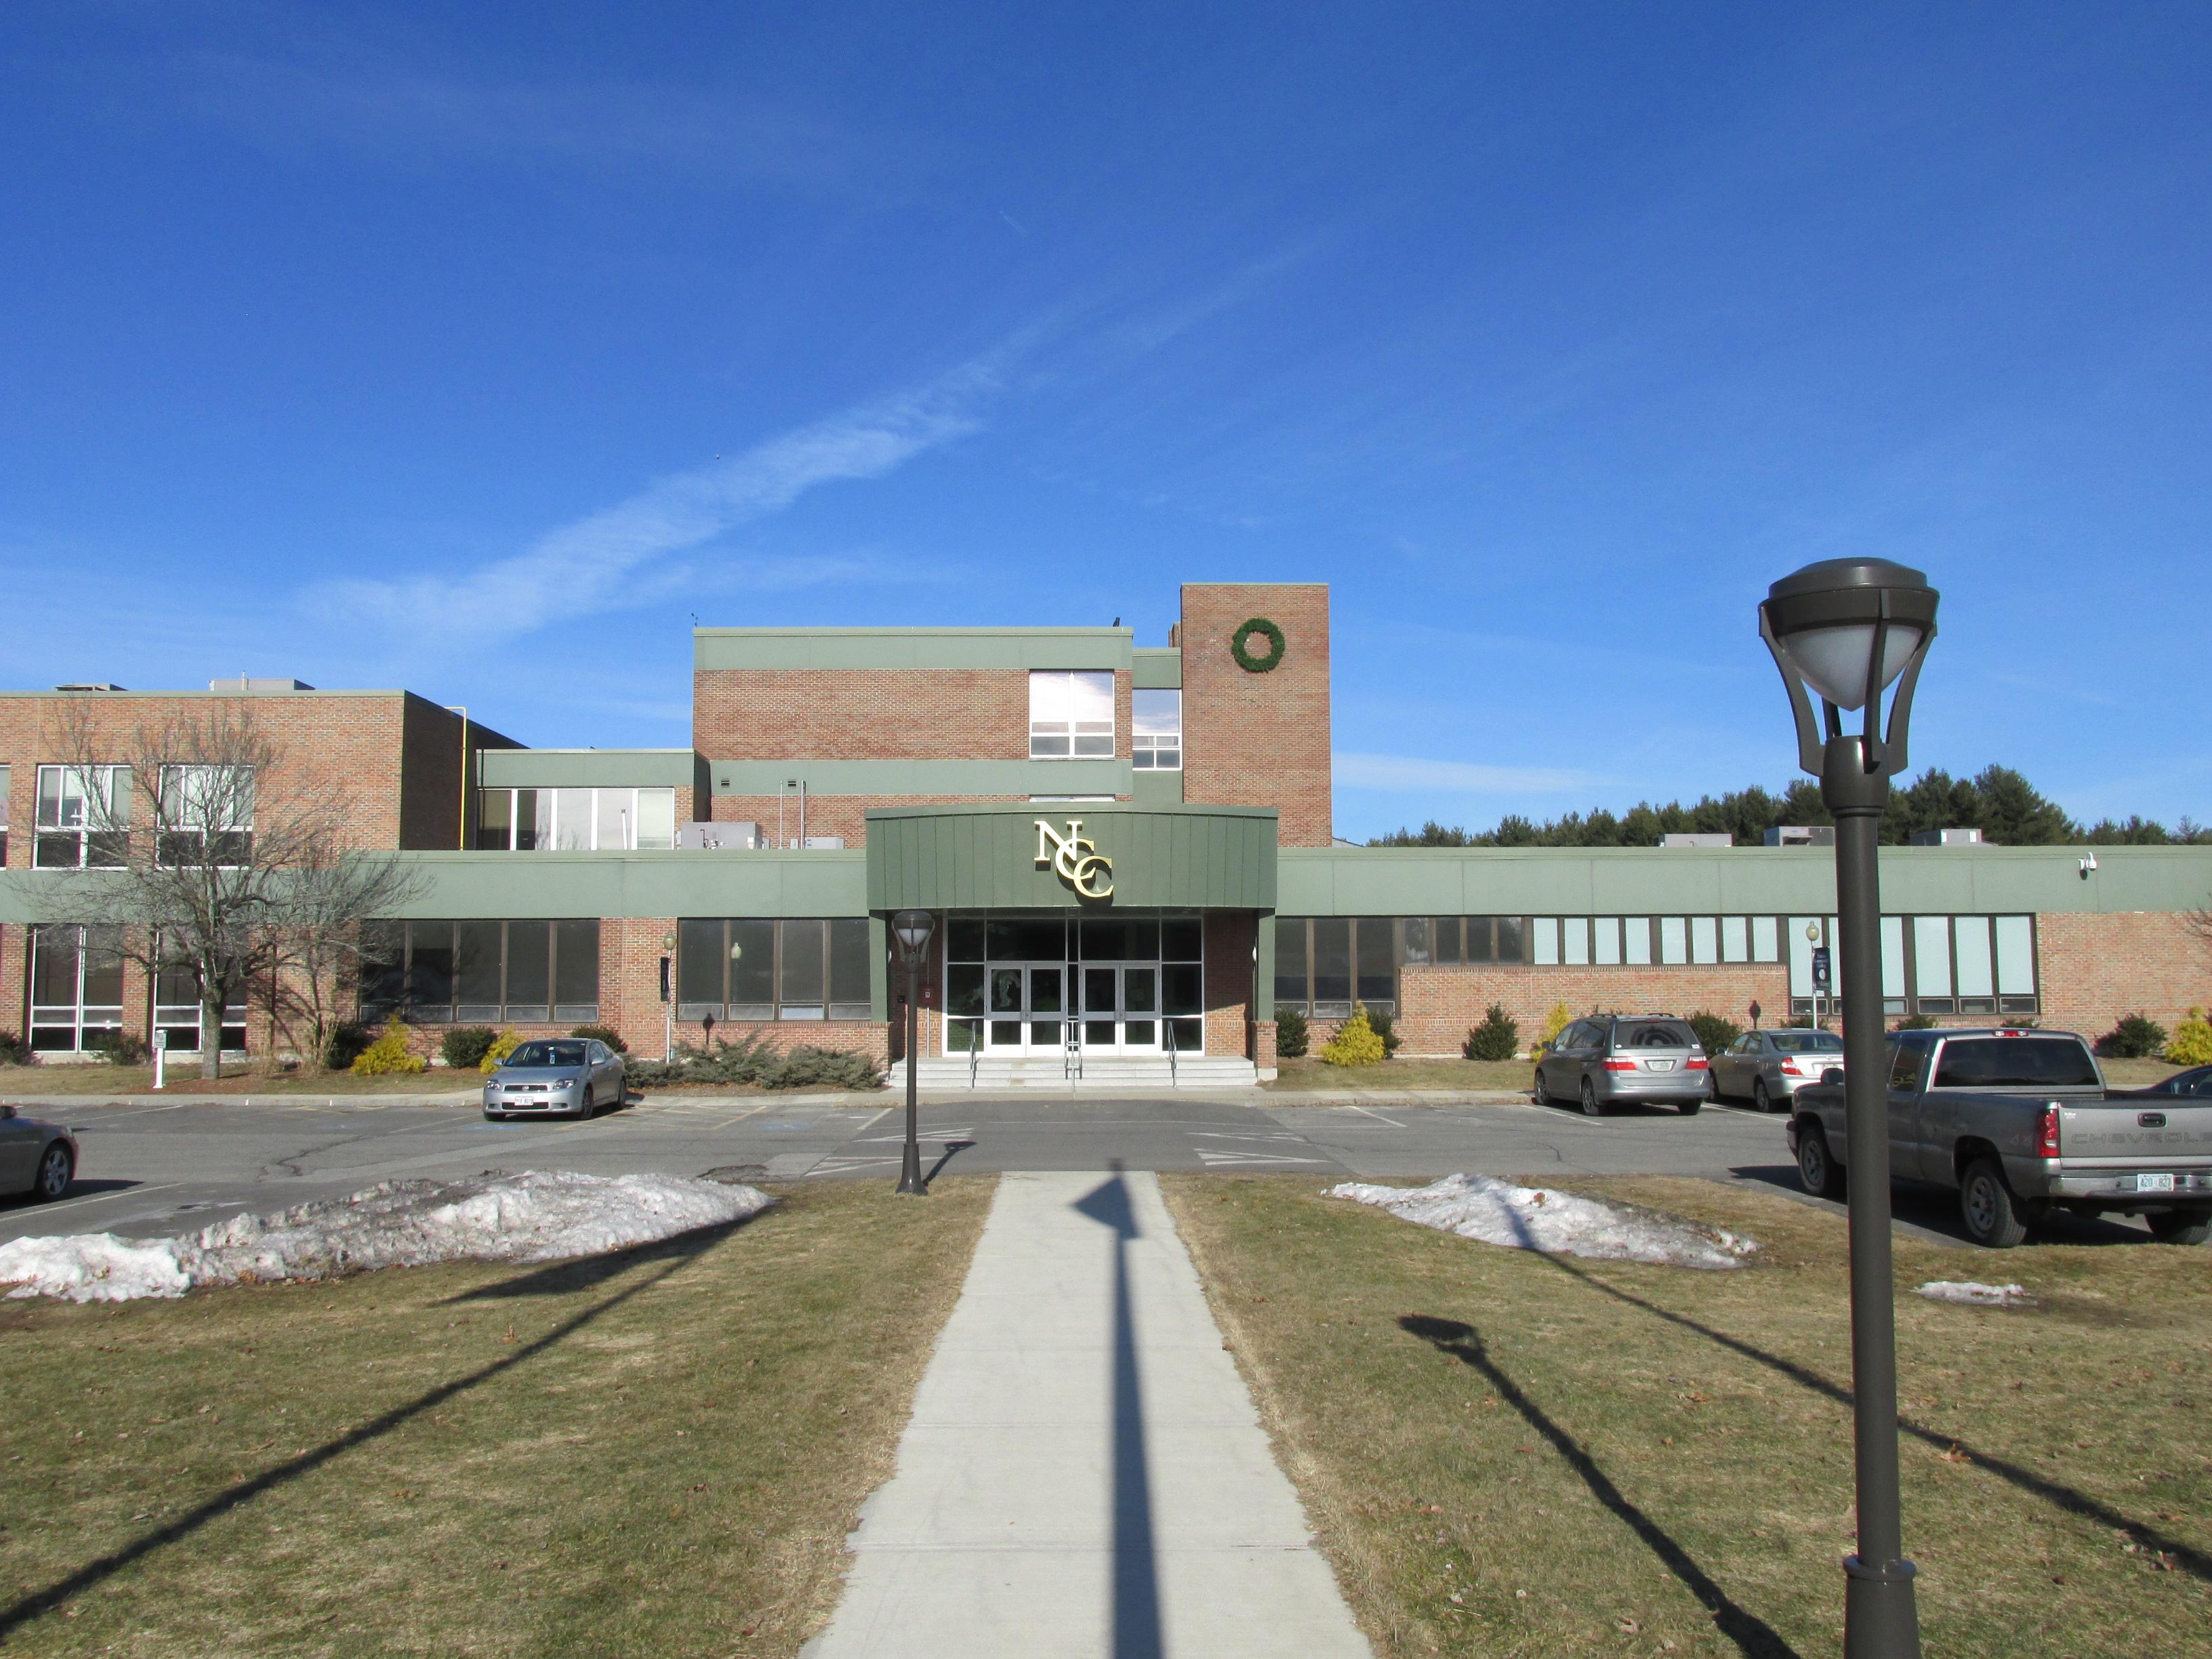 File:Nashua Community College, Nashua NH.jpg - Wikimedia Commons